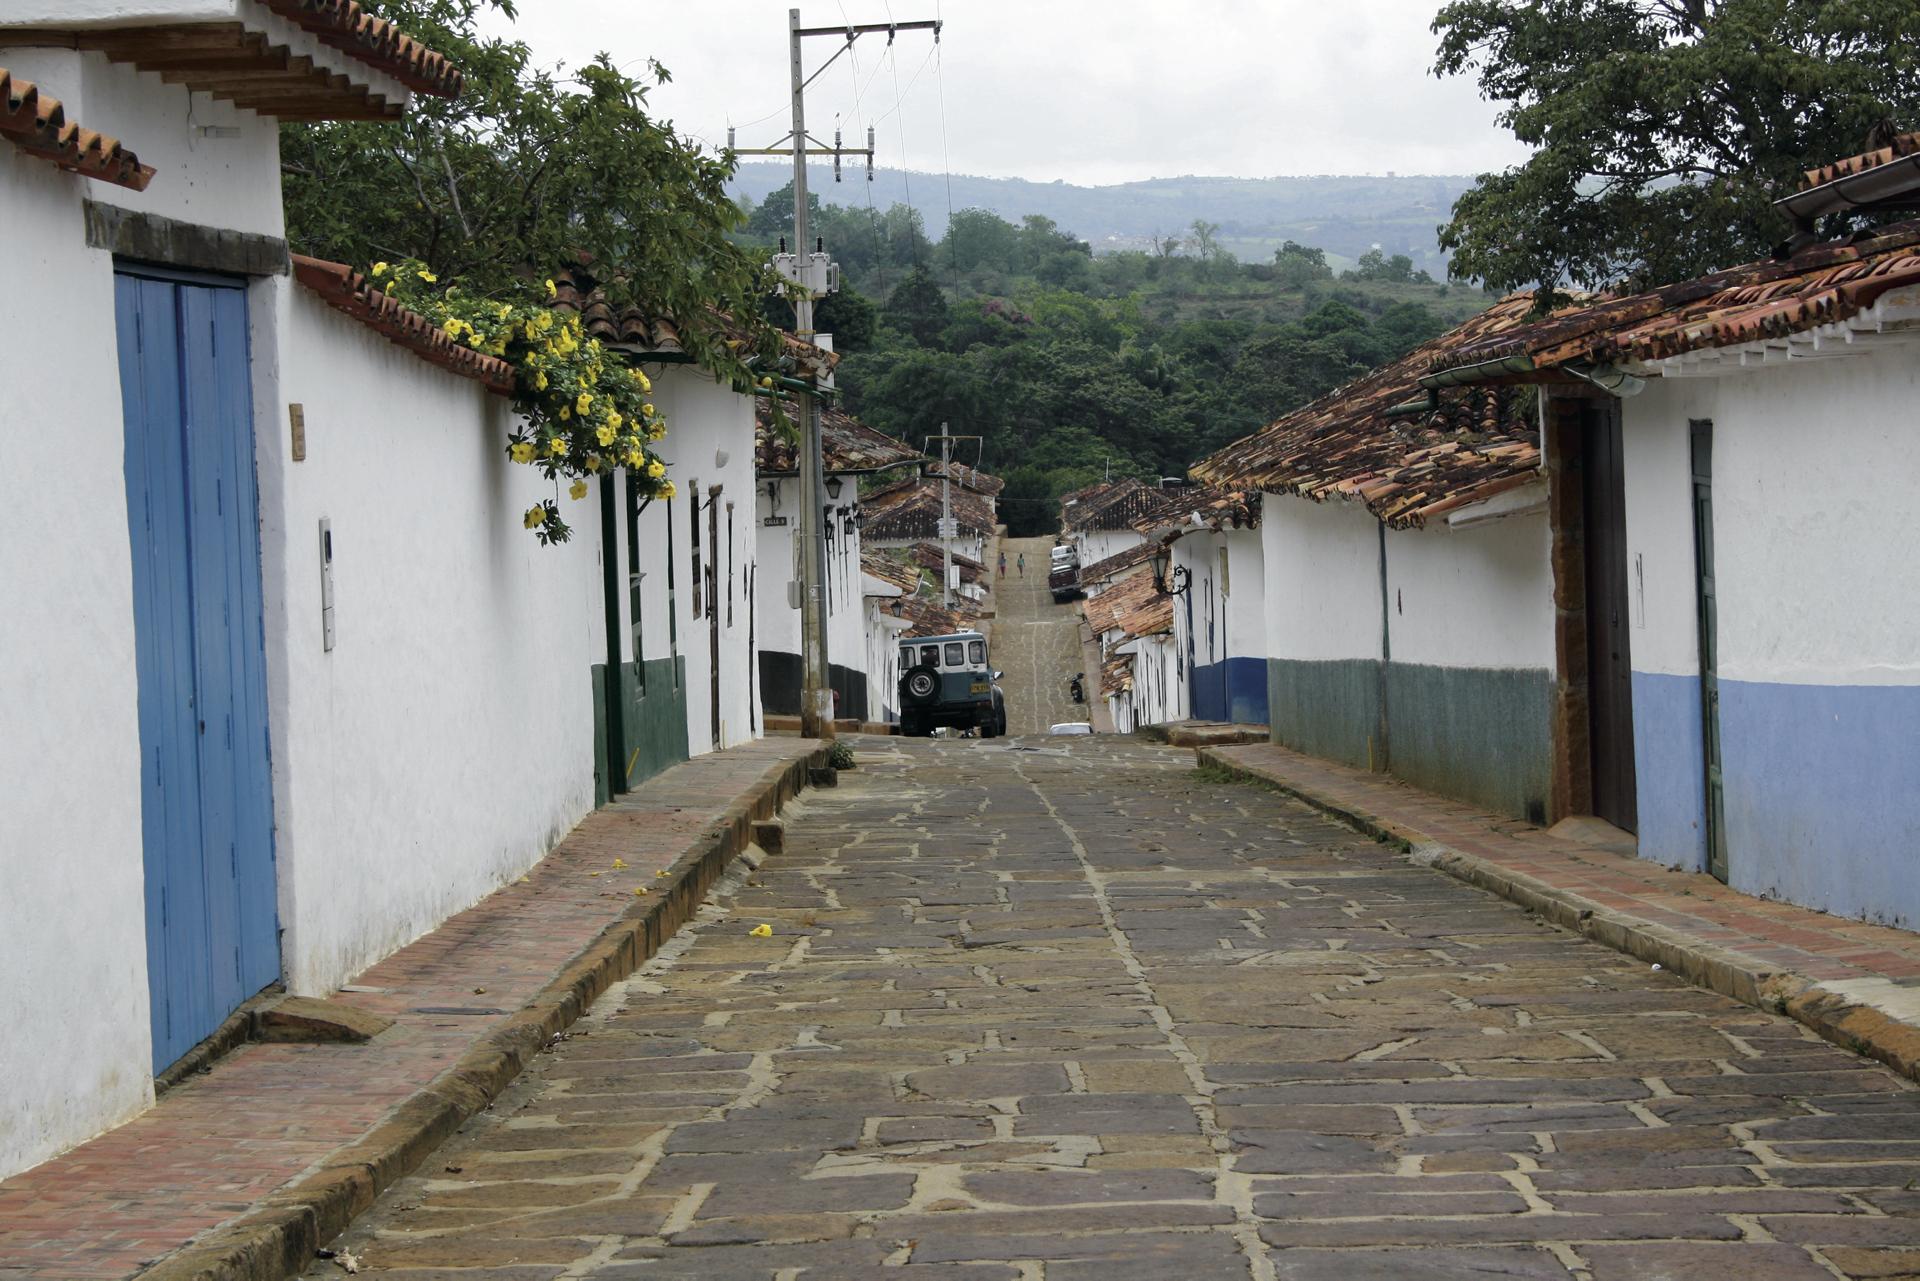 Straßenbild in Barichara